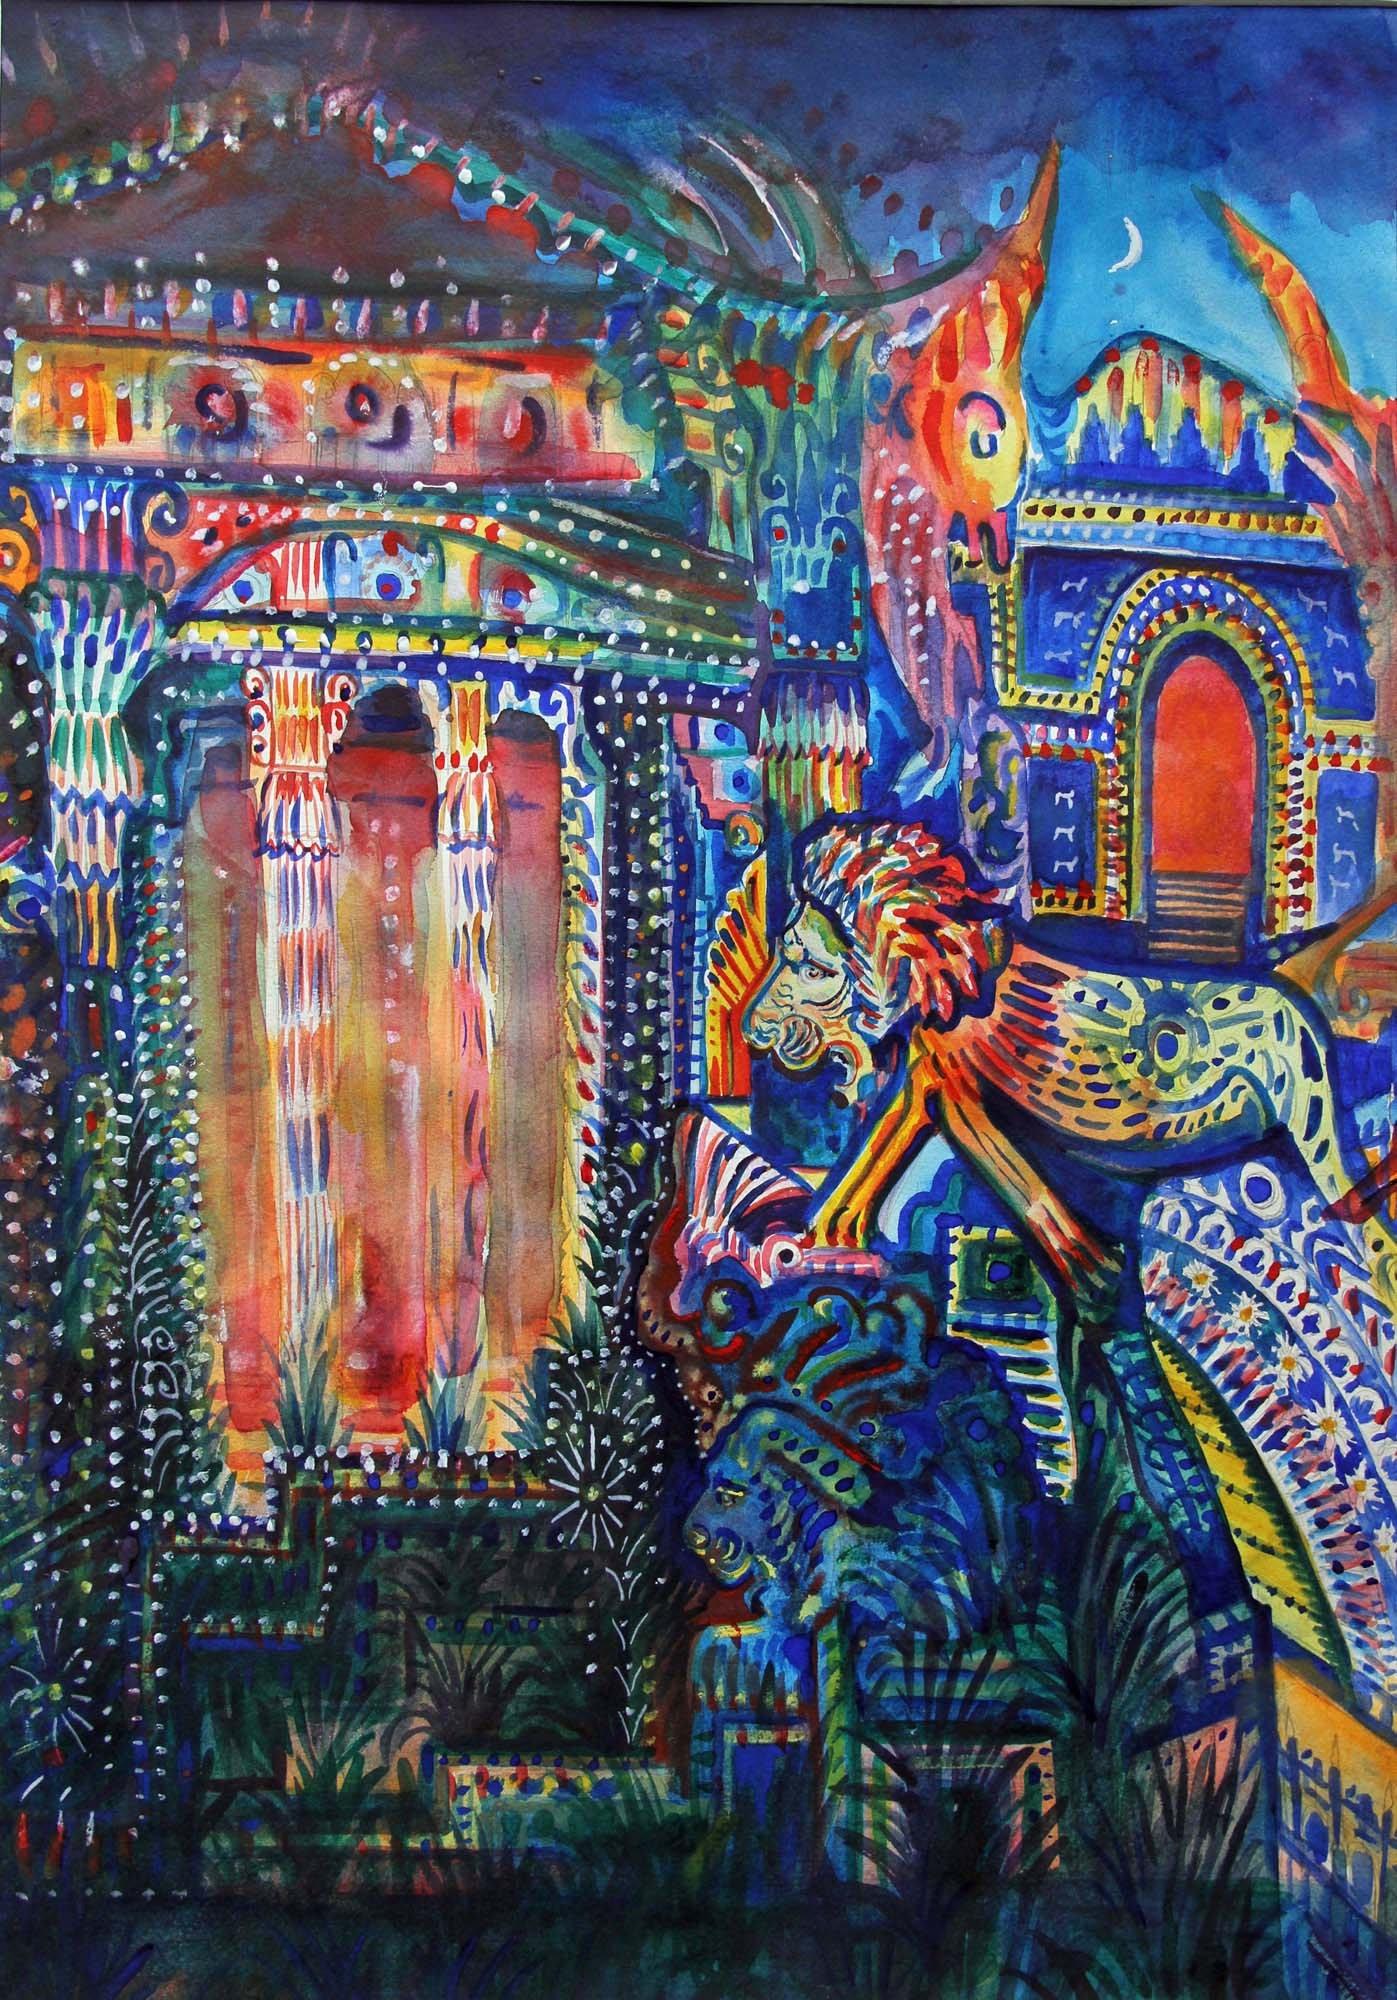 "<span class=""link fancybox-details-link""><a href=""/artists/94-neil-pittaway/works/12140-neil-pittaway-assyrian-lion-palace/"">View Detail Page</a></span><div class=""artist""><span class=""artist""><strong>Neil Pittaway</strong></span></div><div class=""title""><em>Assyrian Lion Palace</em></div><div class=""medium"">watercolour & bodycolour</div><div class=""dimensions"">Frame: 82 x 62 cm<br /> Artwork: 69 x 45 cm</div><div class=""price"">£695.00</div>"